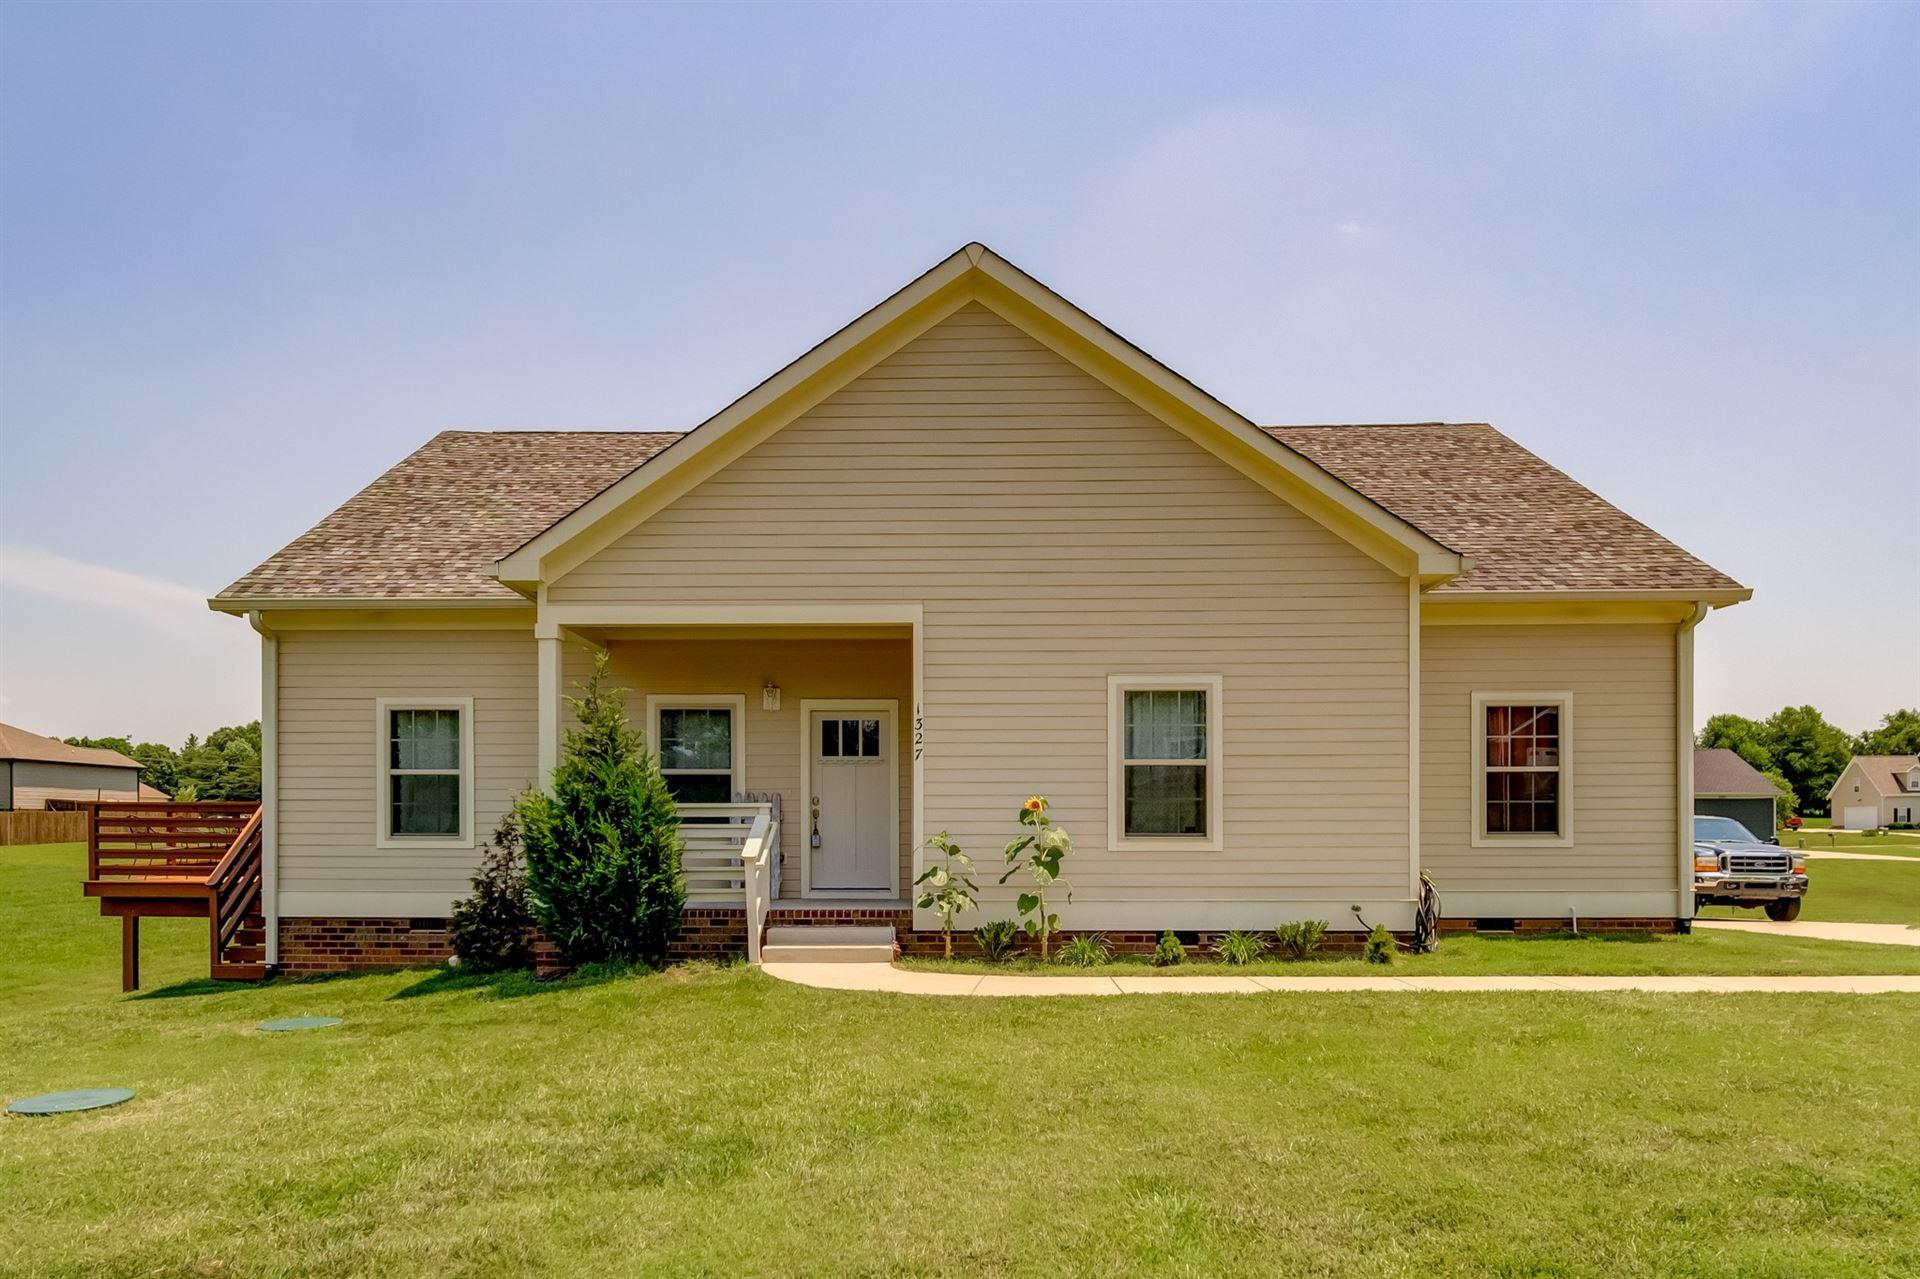 Photo of 1327 Everwood Dr, Ashland City, TN 37015 (MLS # 2262894)